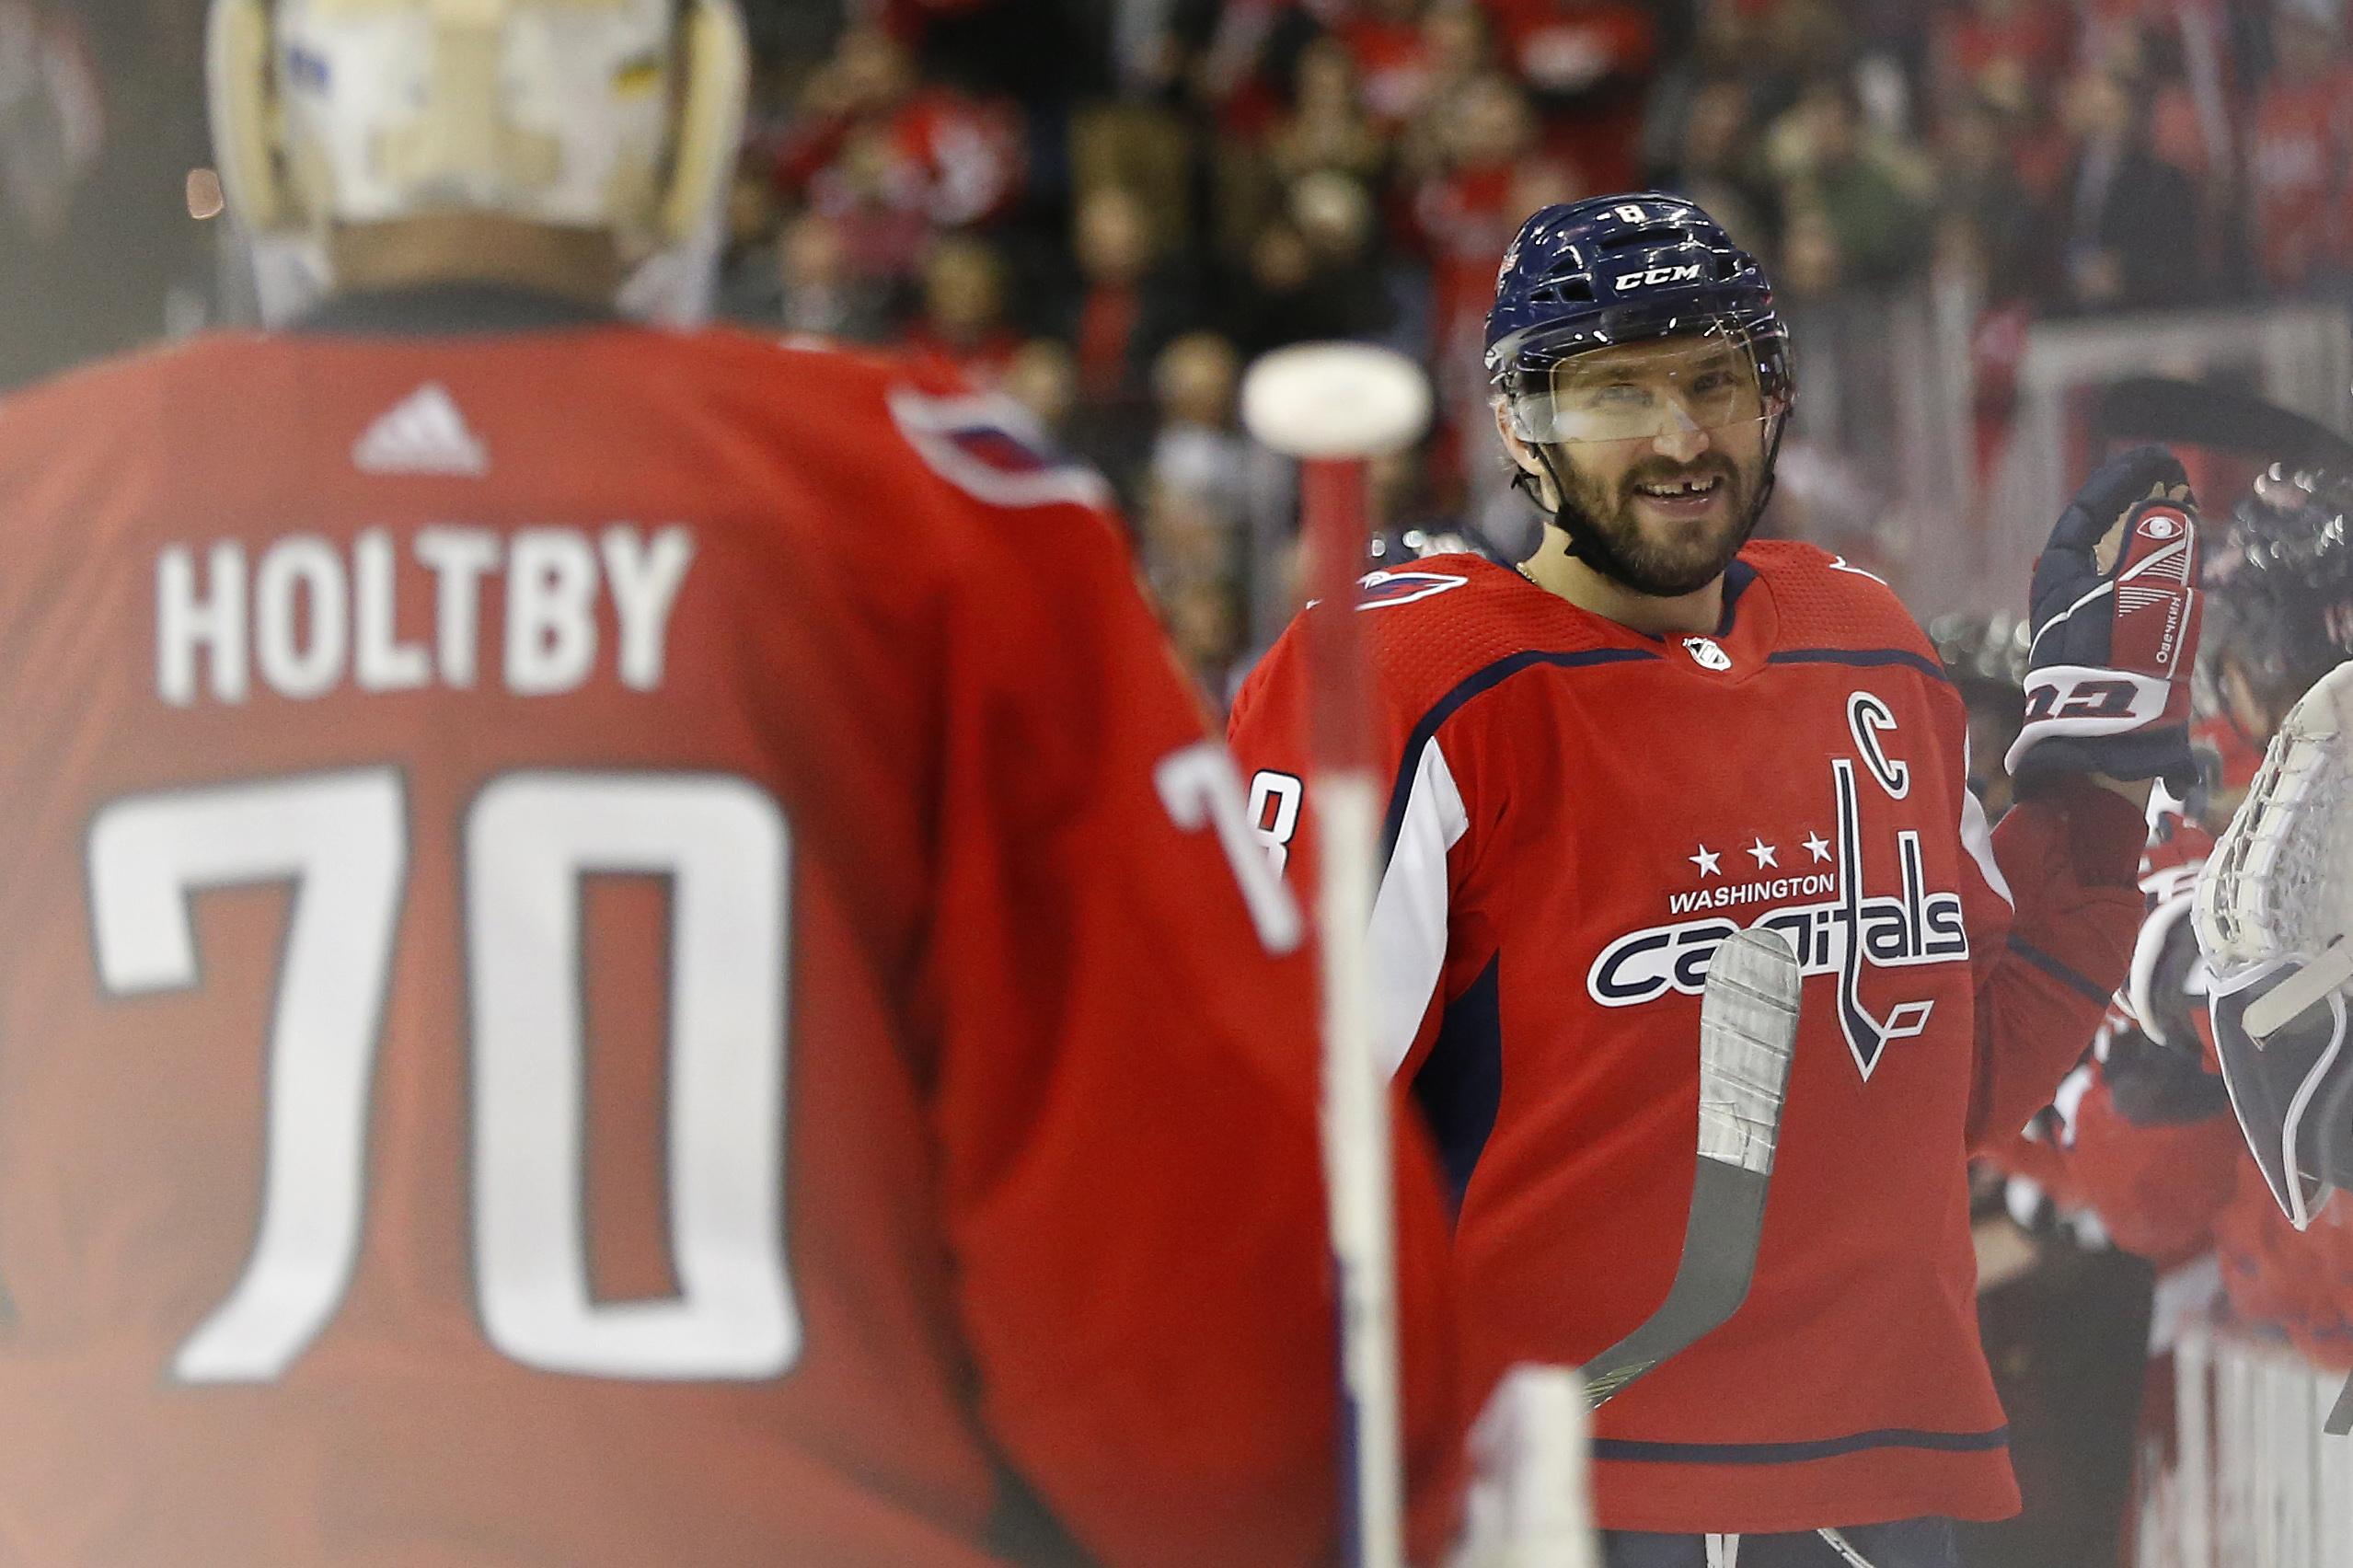 Watch: Washington Capitals' Alex Ovechkin records 21st Hat Trick